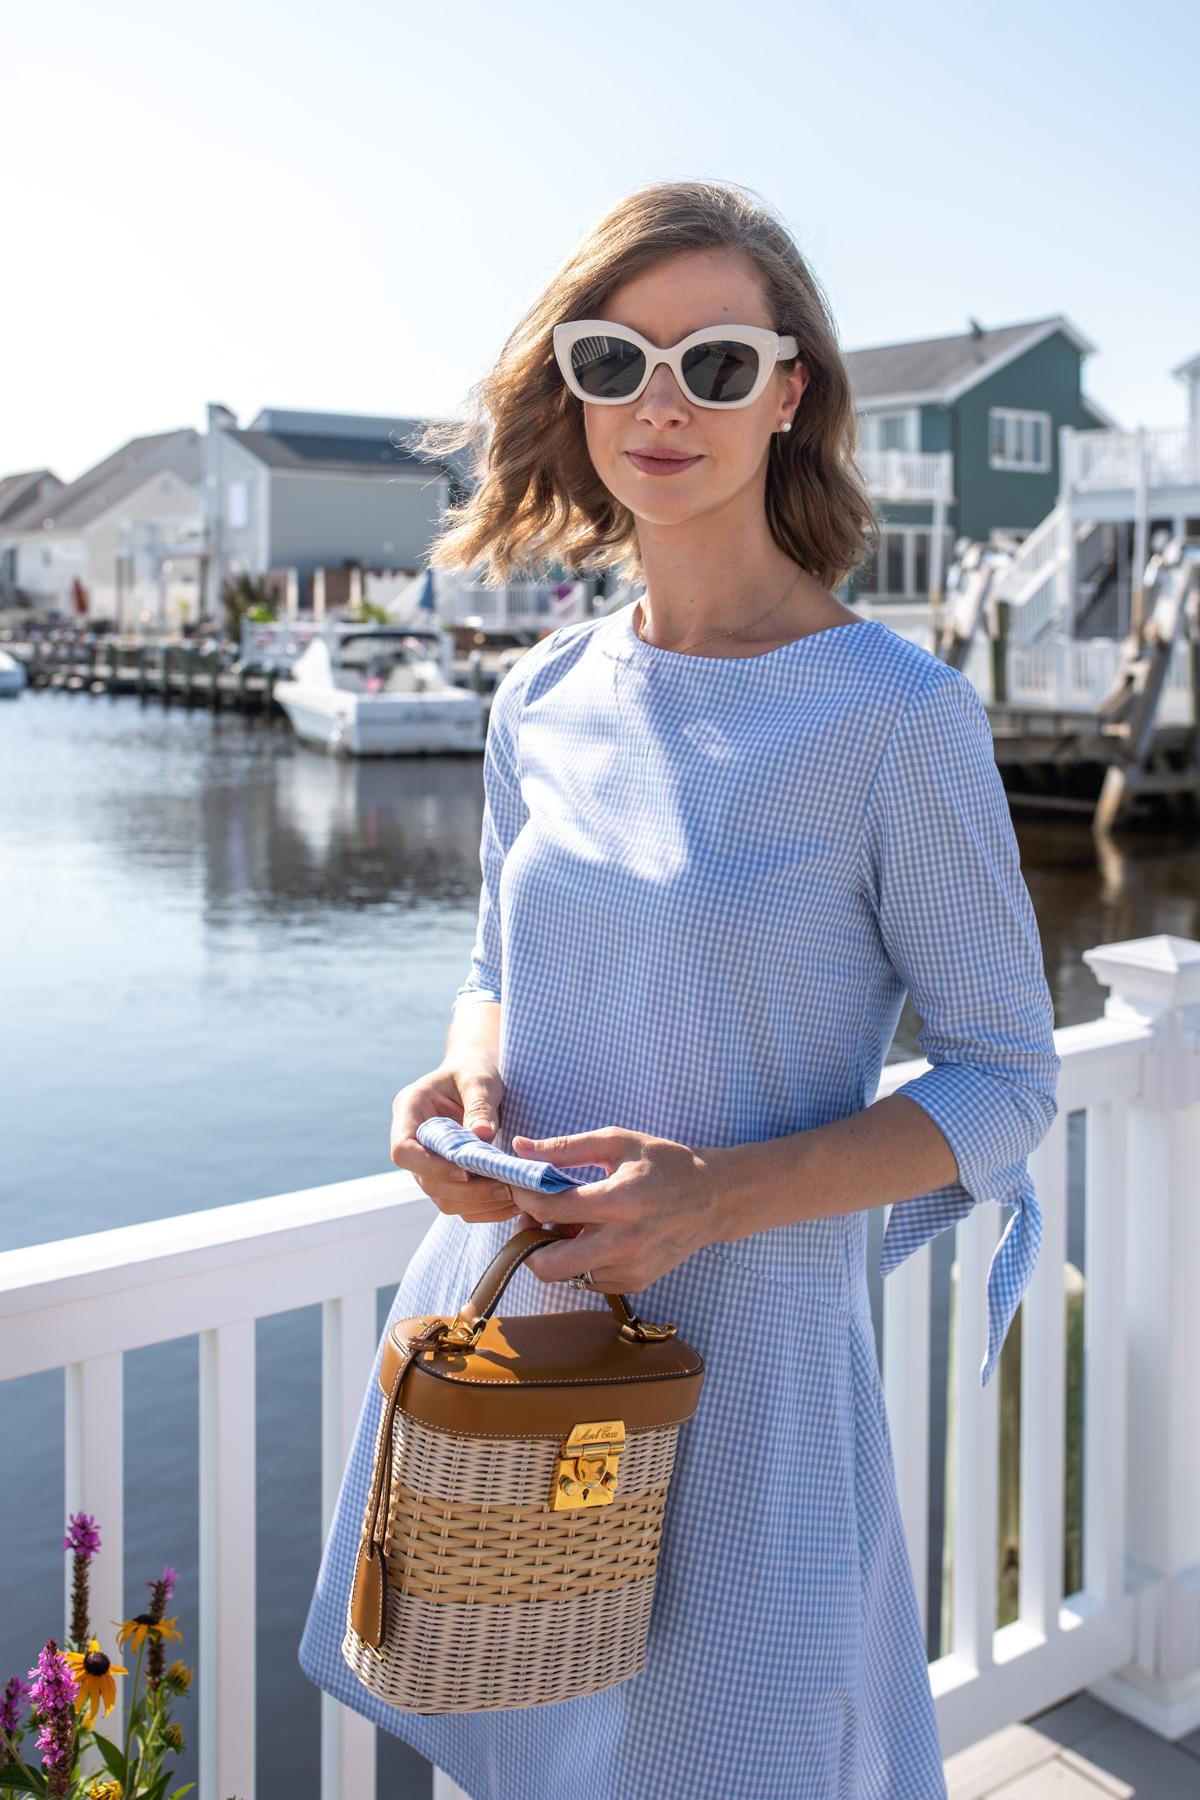 Stacie Flinner x Marta Scarampi Cotton Dress and Face mask-13.jpg